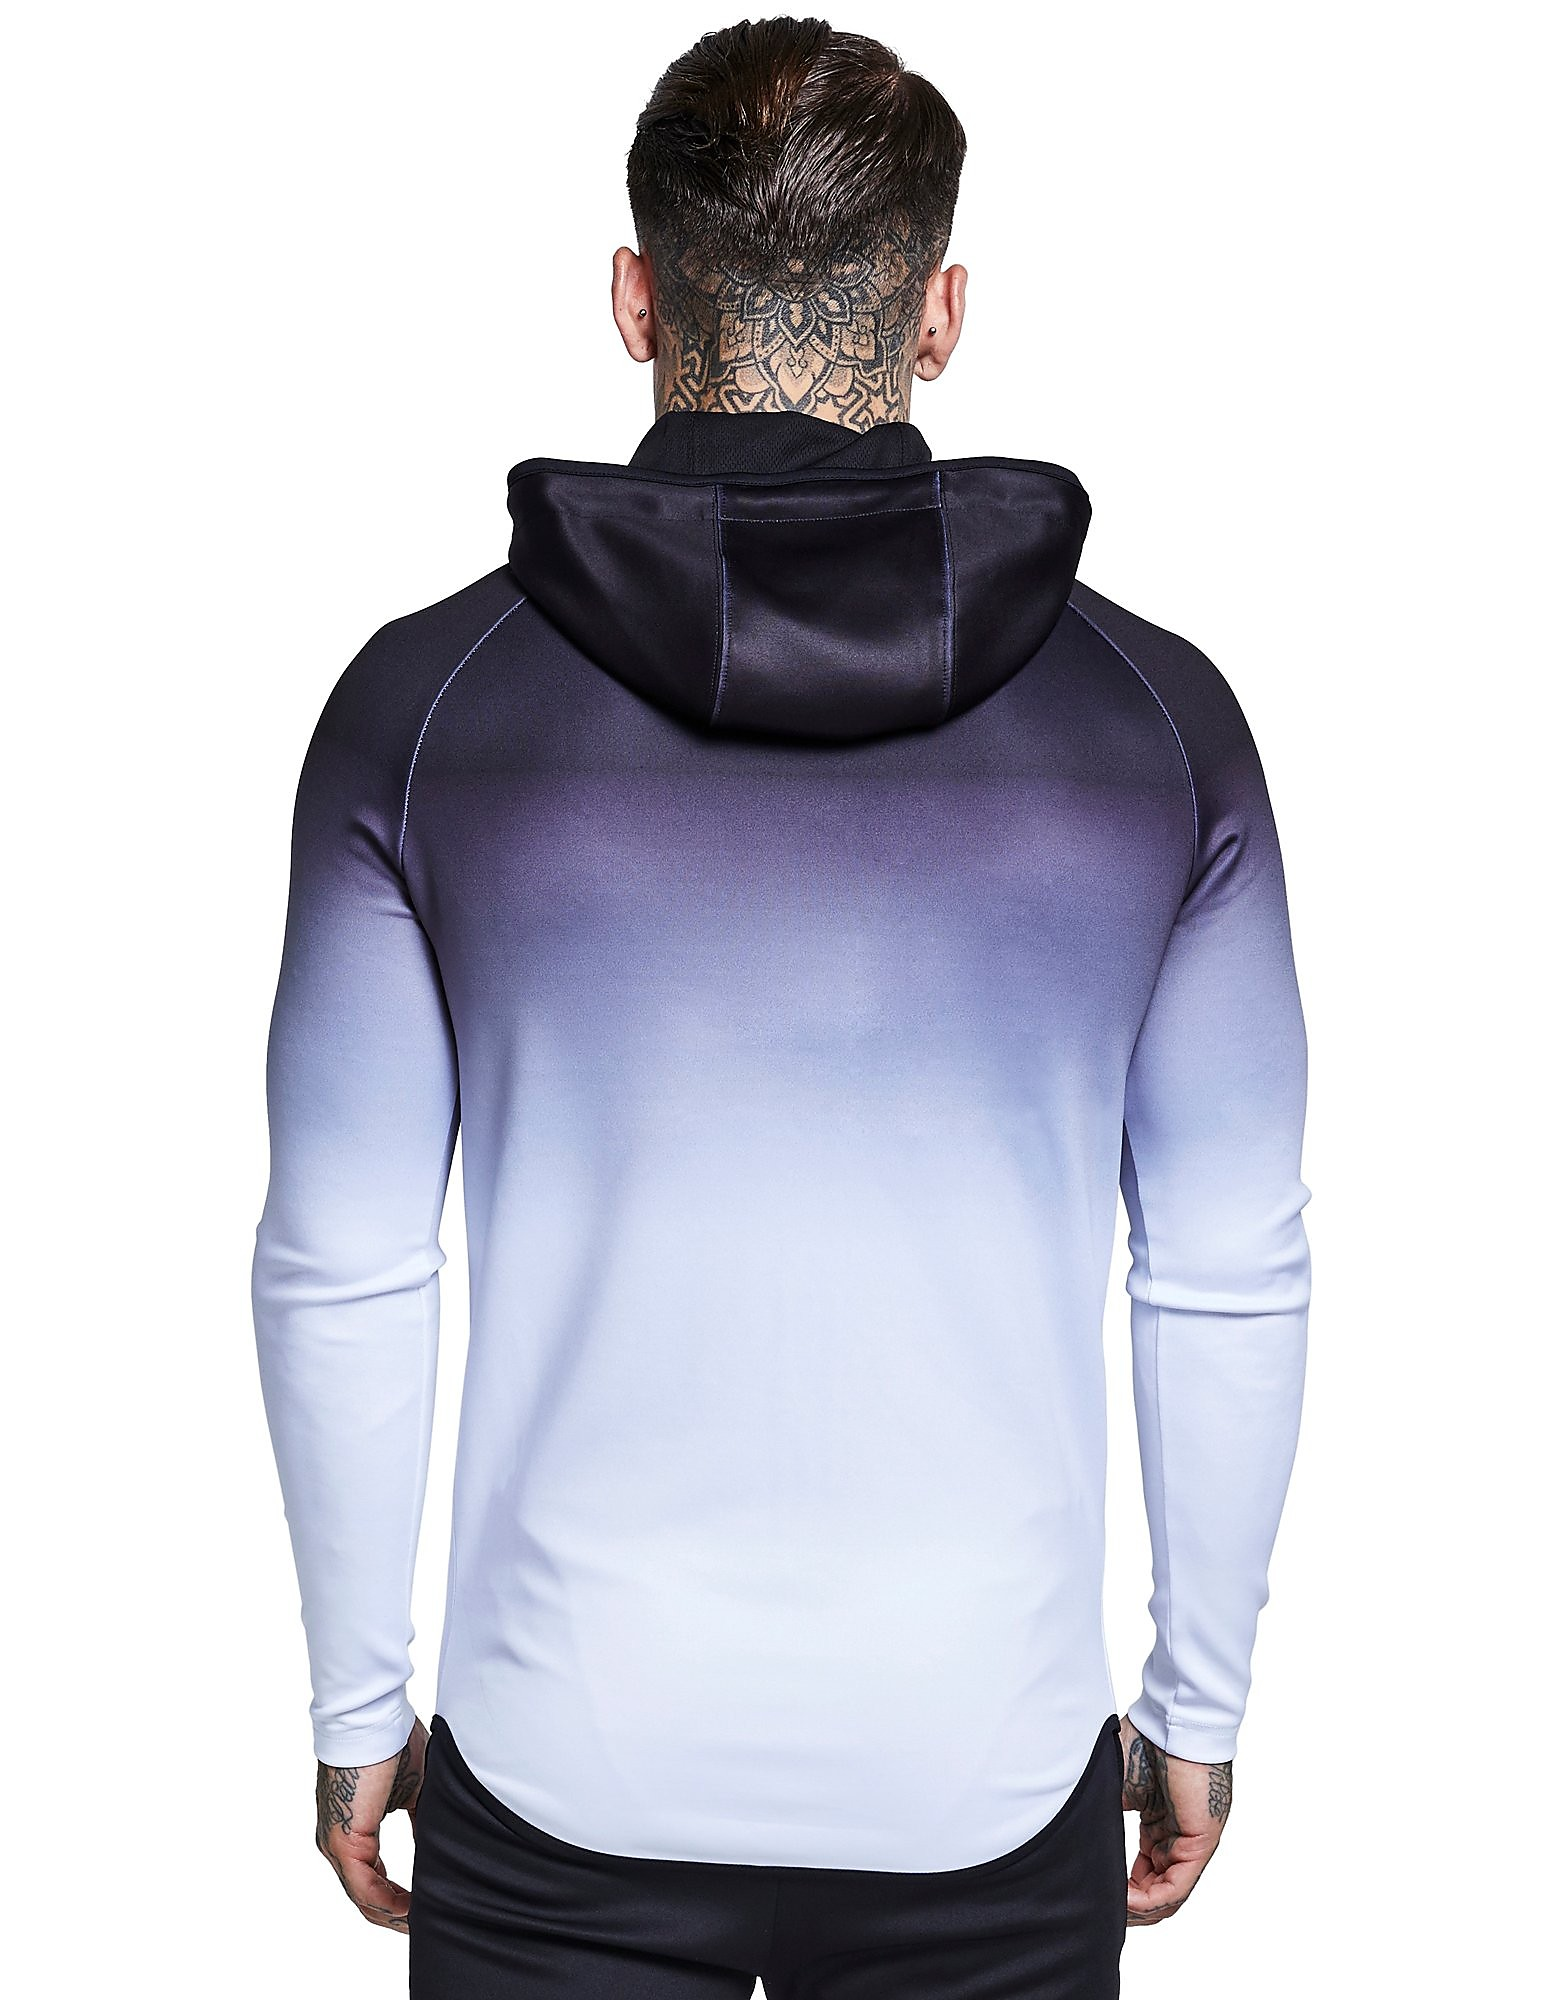 SikSilk Athlete Zip Through Fade Hoodie